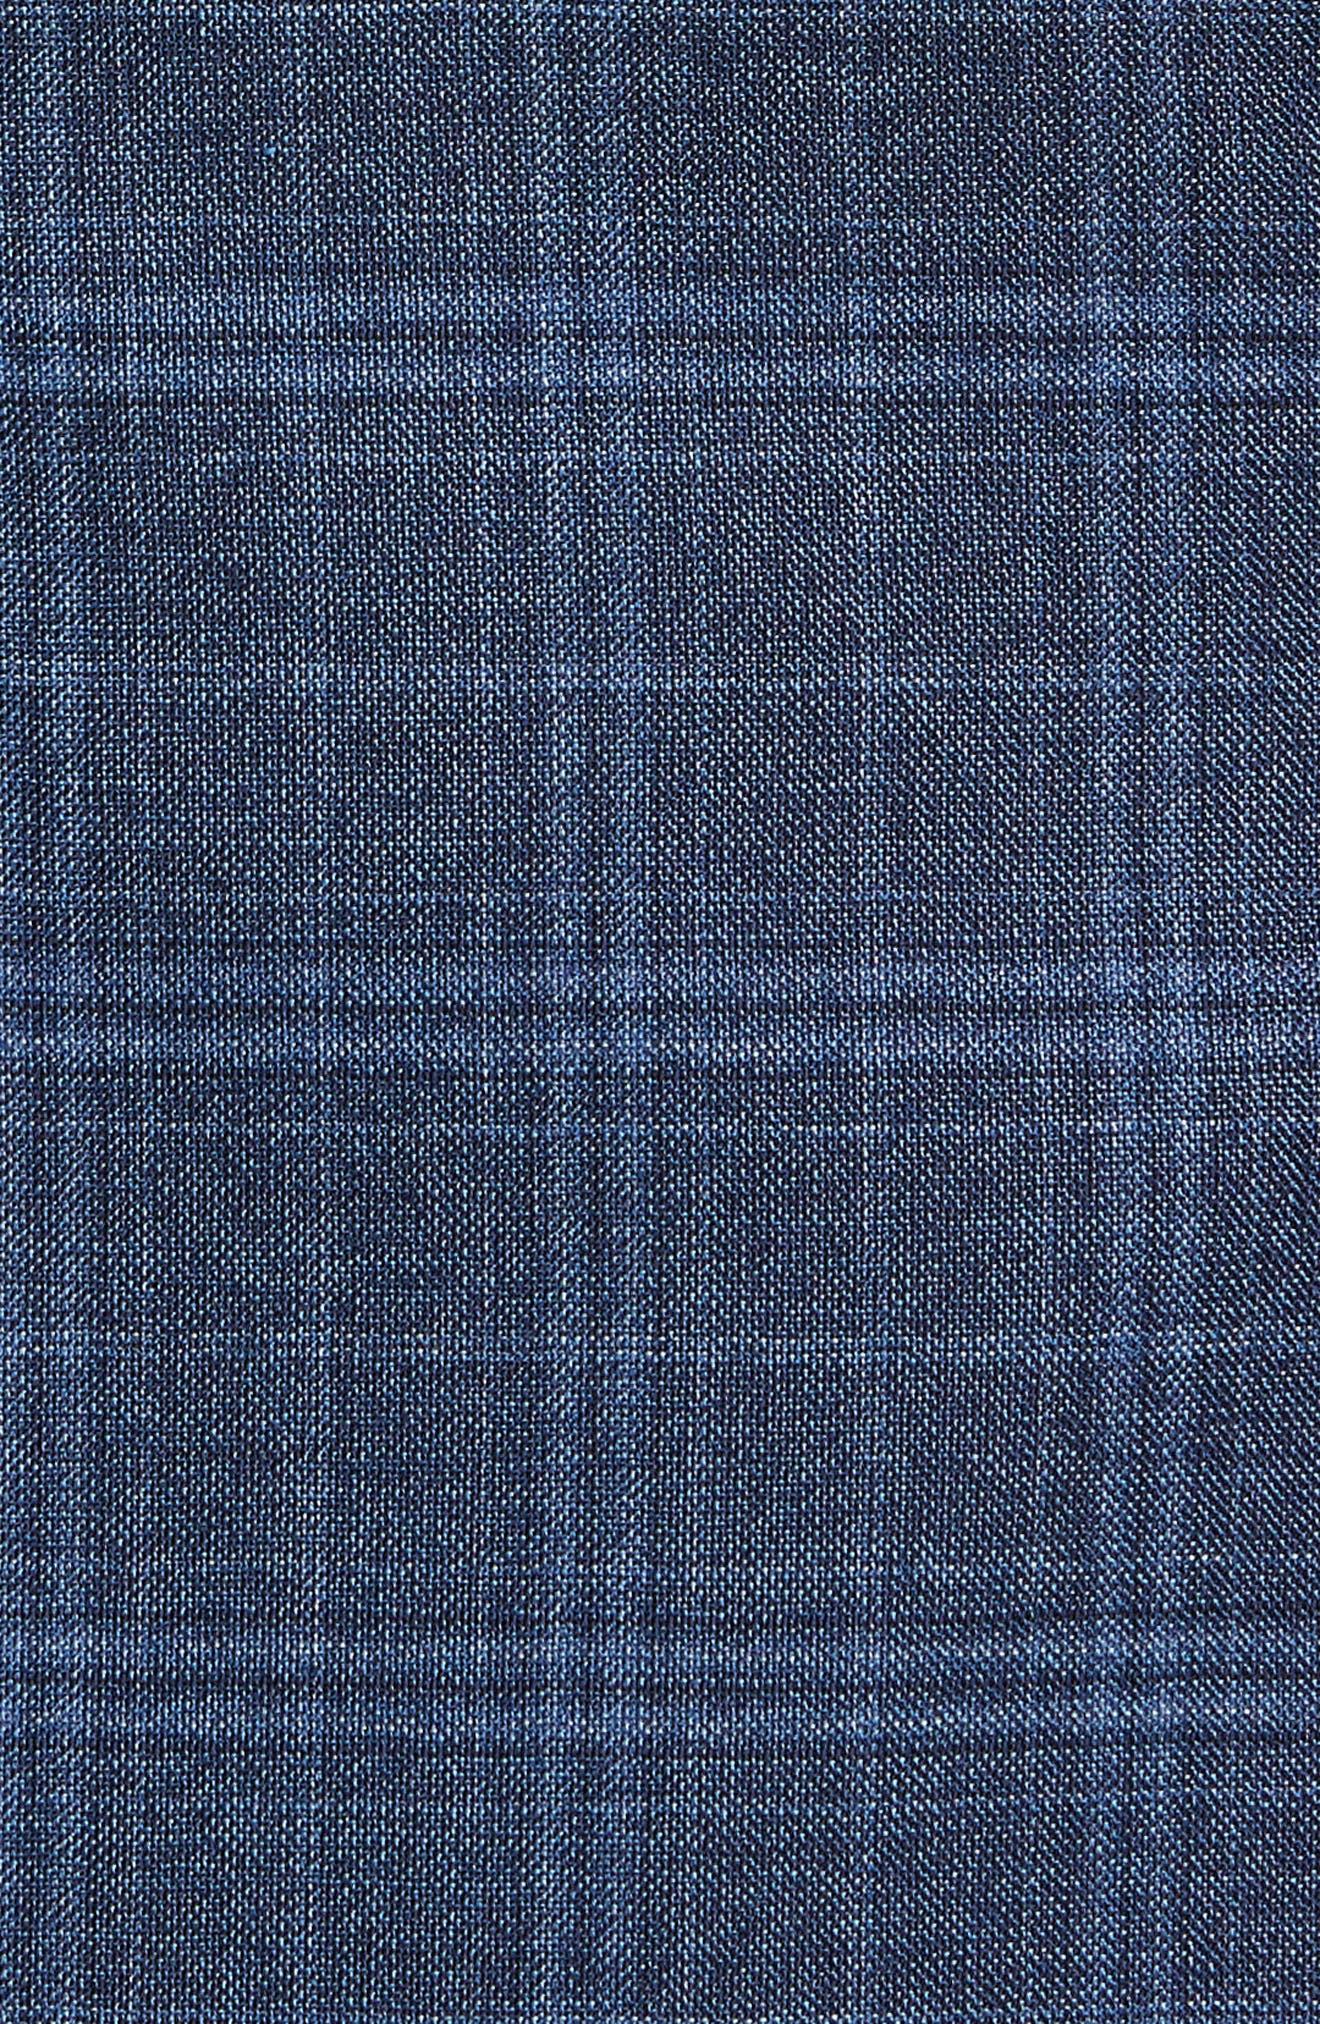 Hutsons Trim Fit Plaid Wool Sport Coat,                             Alternate thumbnail 5, color,                             Medium Blue/ Navy